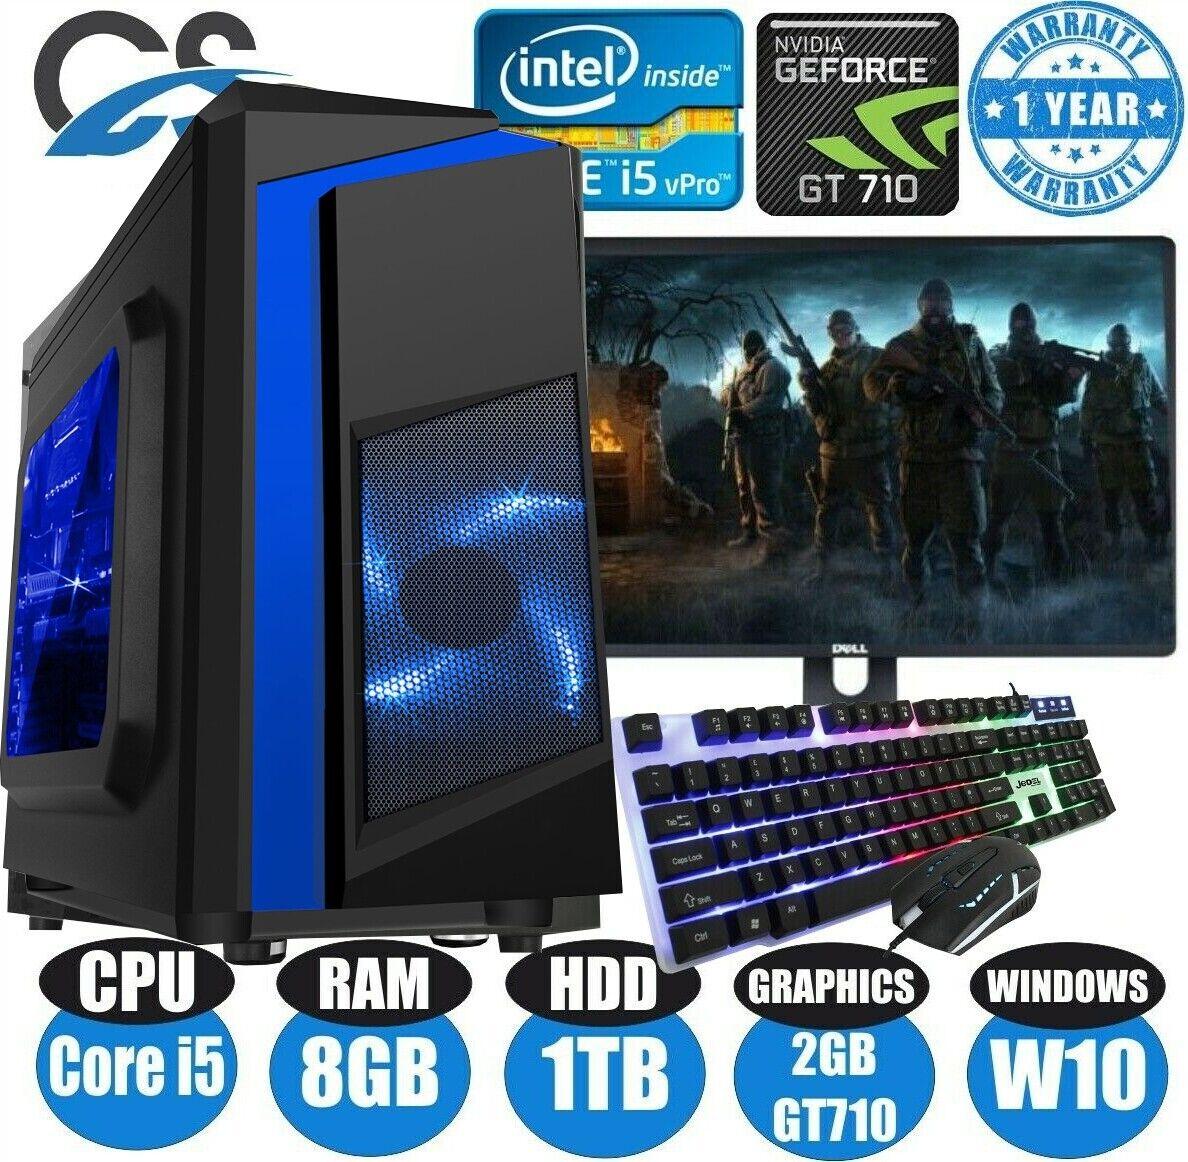 Computer Games - Fast Gaming PC Computer Bundle Intel Quad Core i5 8GB 1TB Windows 10 2GB GT710